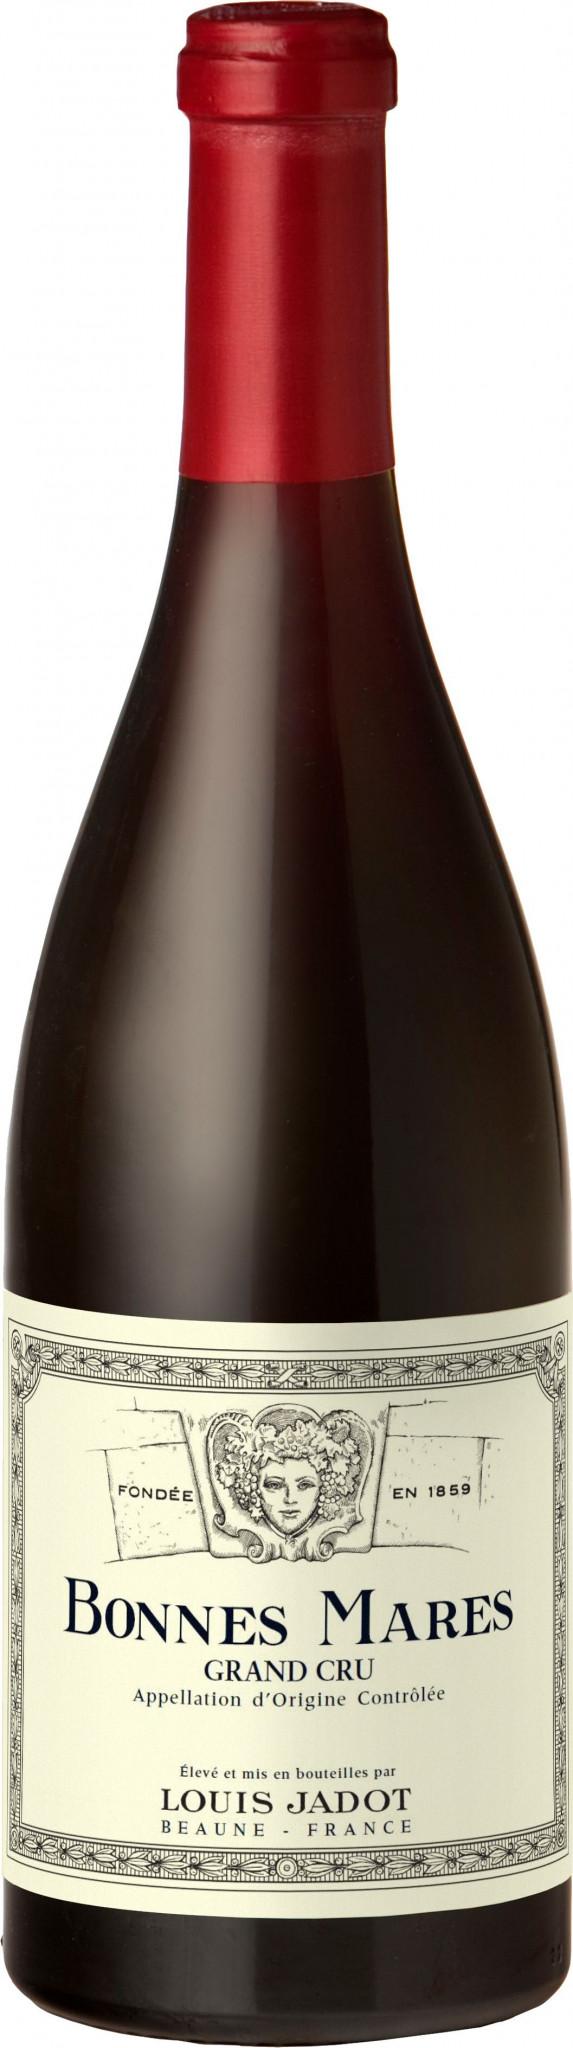 Louis Jadot Bonnes Mares Grand Cru Wineaffair